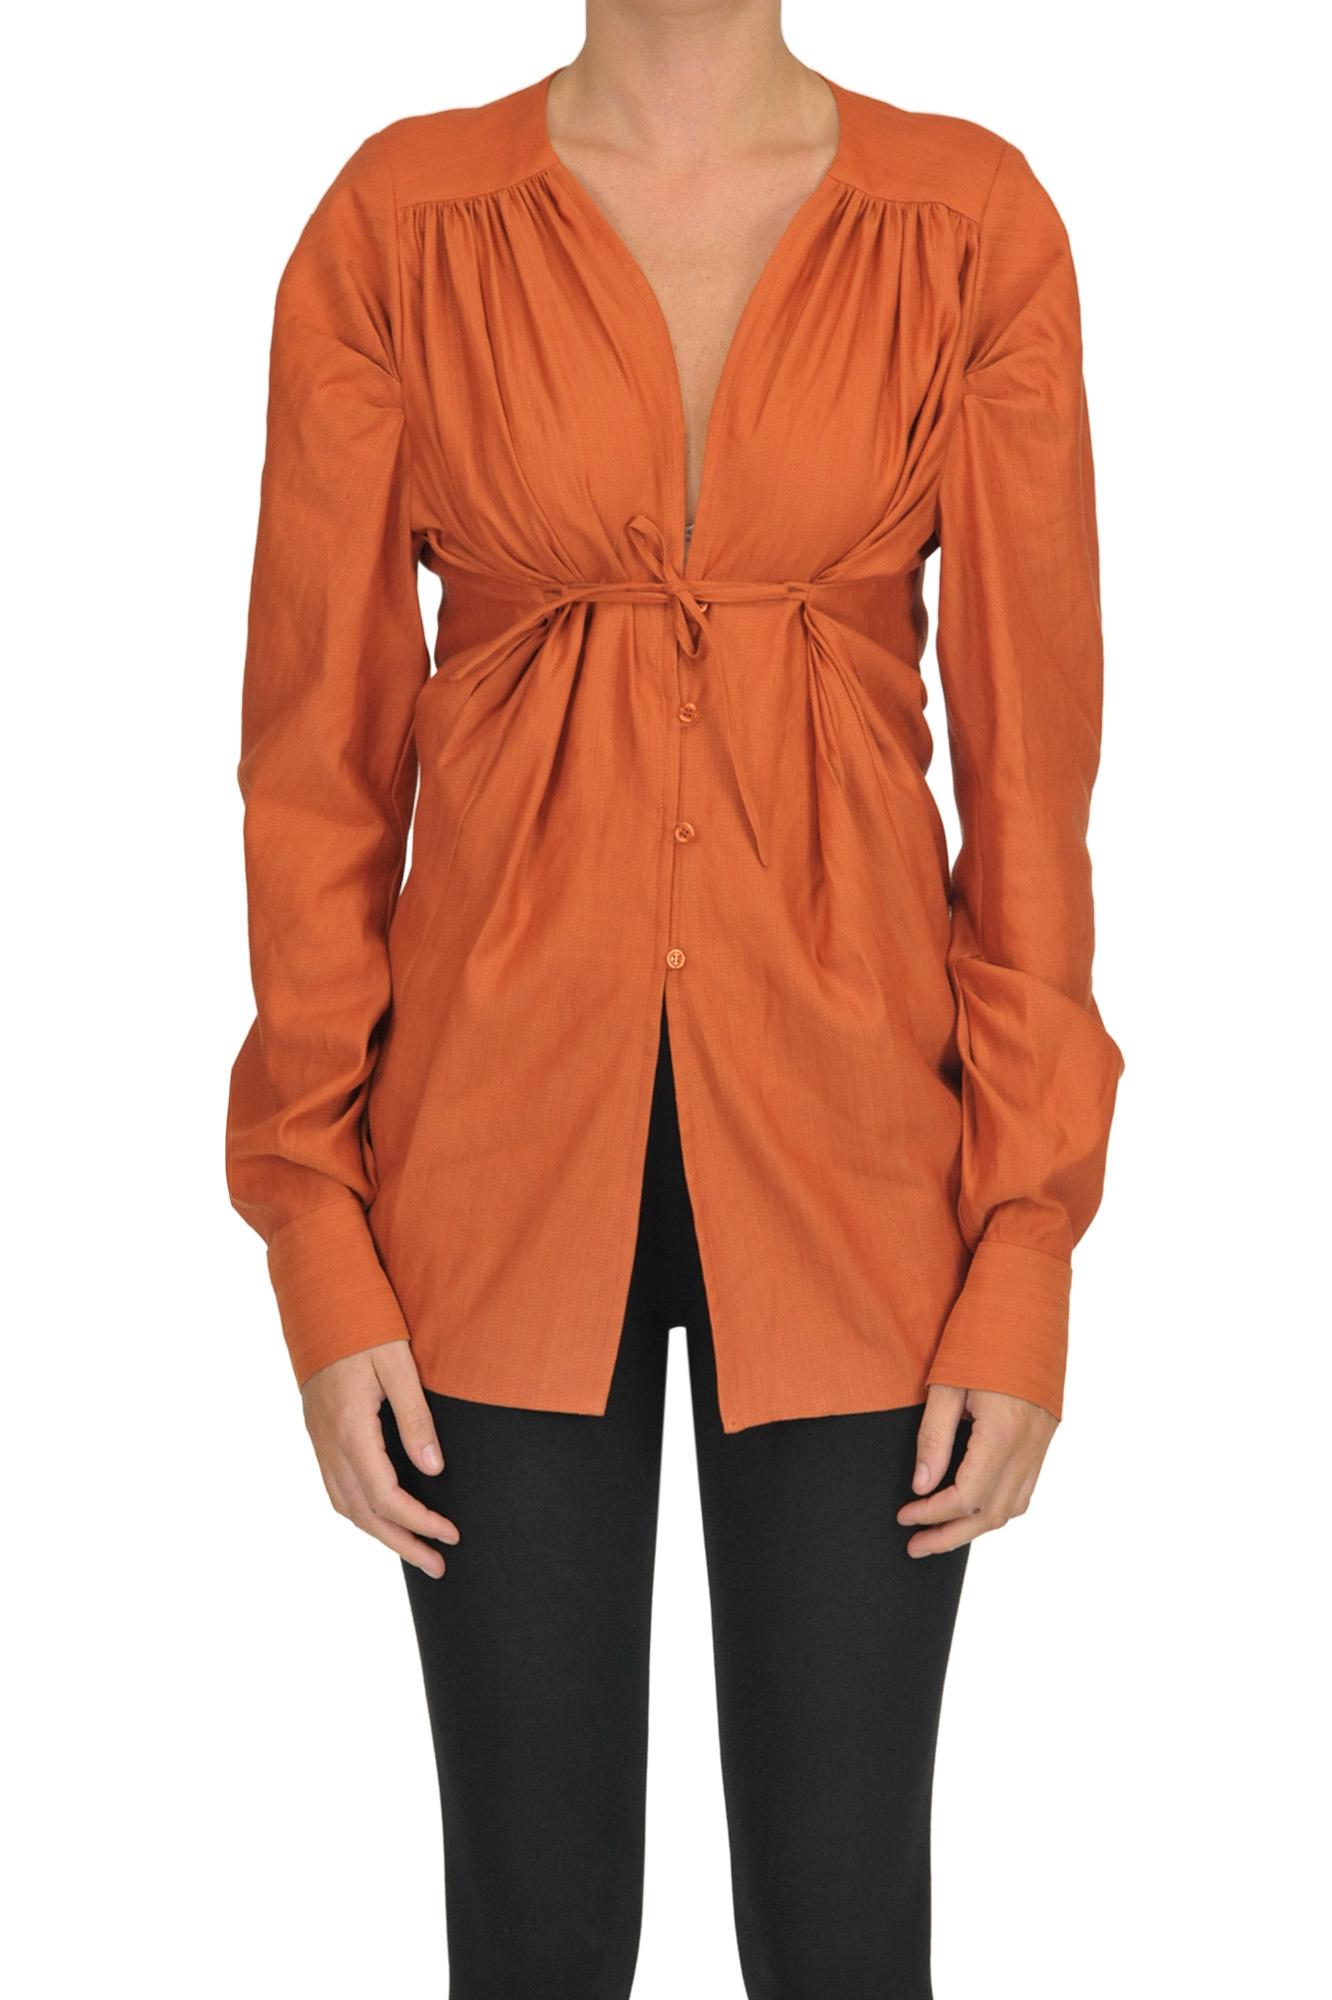 Jacquemus Linen-Blend Shirt In Orange